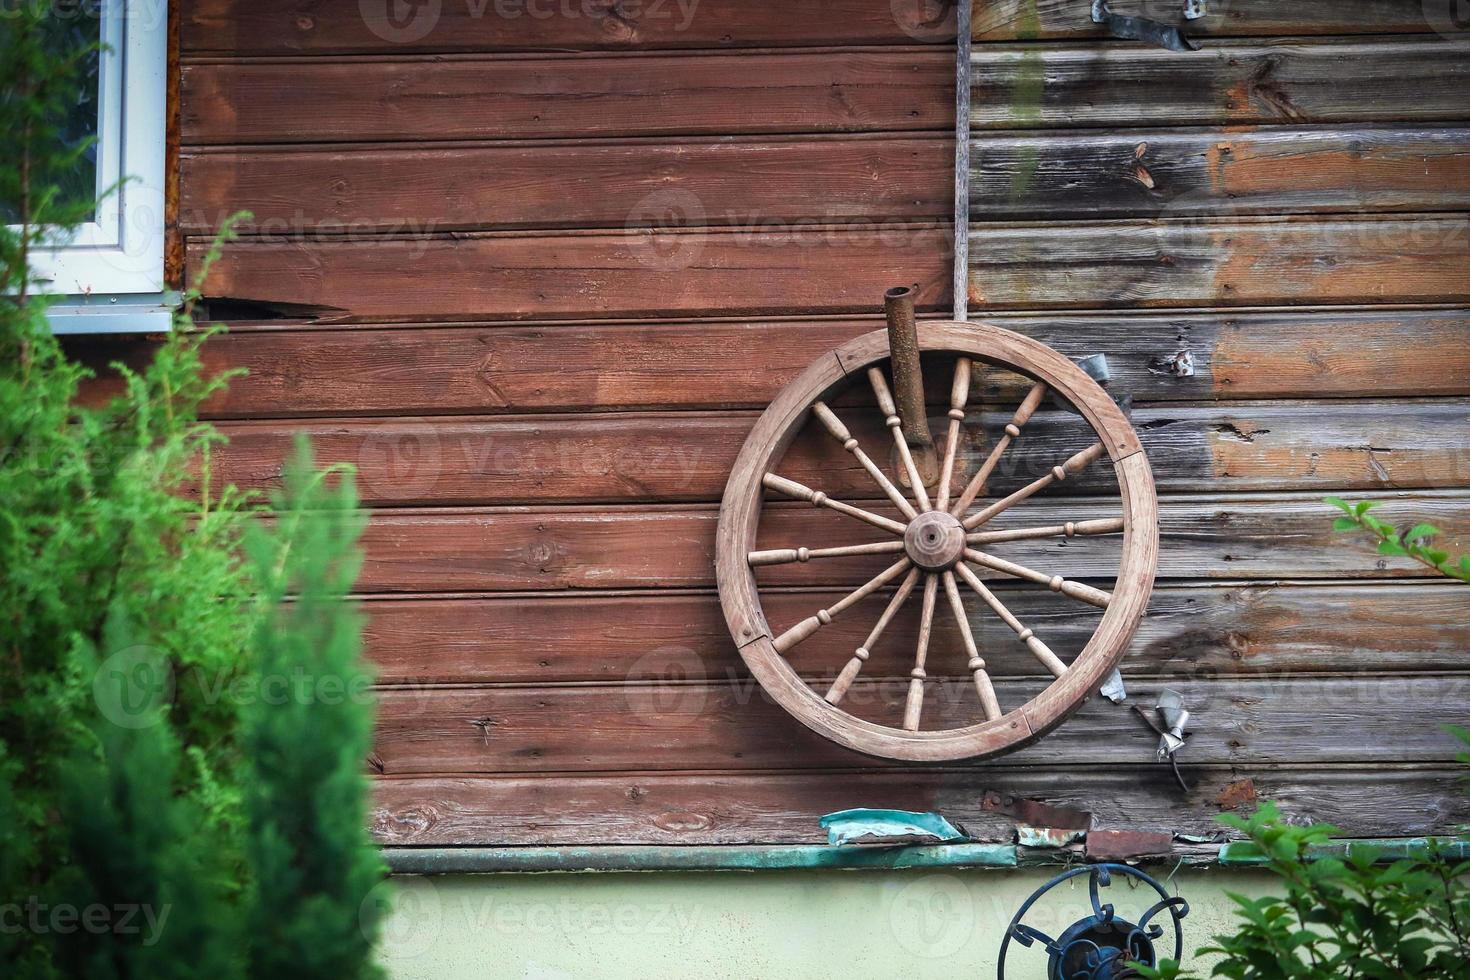 Gran rueda de madera antigua colgada en la pared de tablones de madera de una casa rural foto